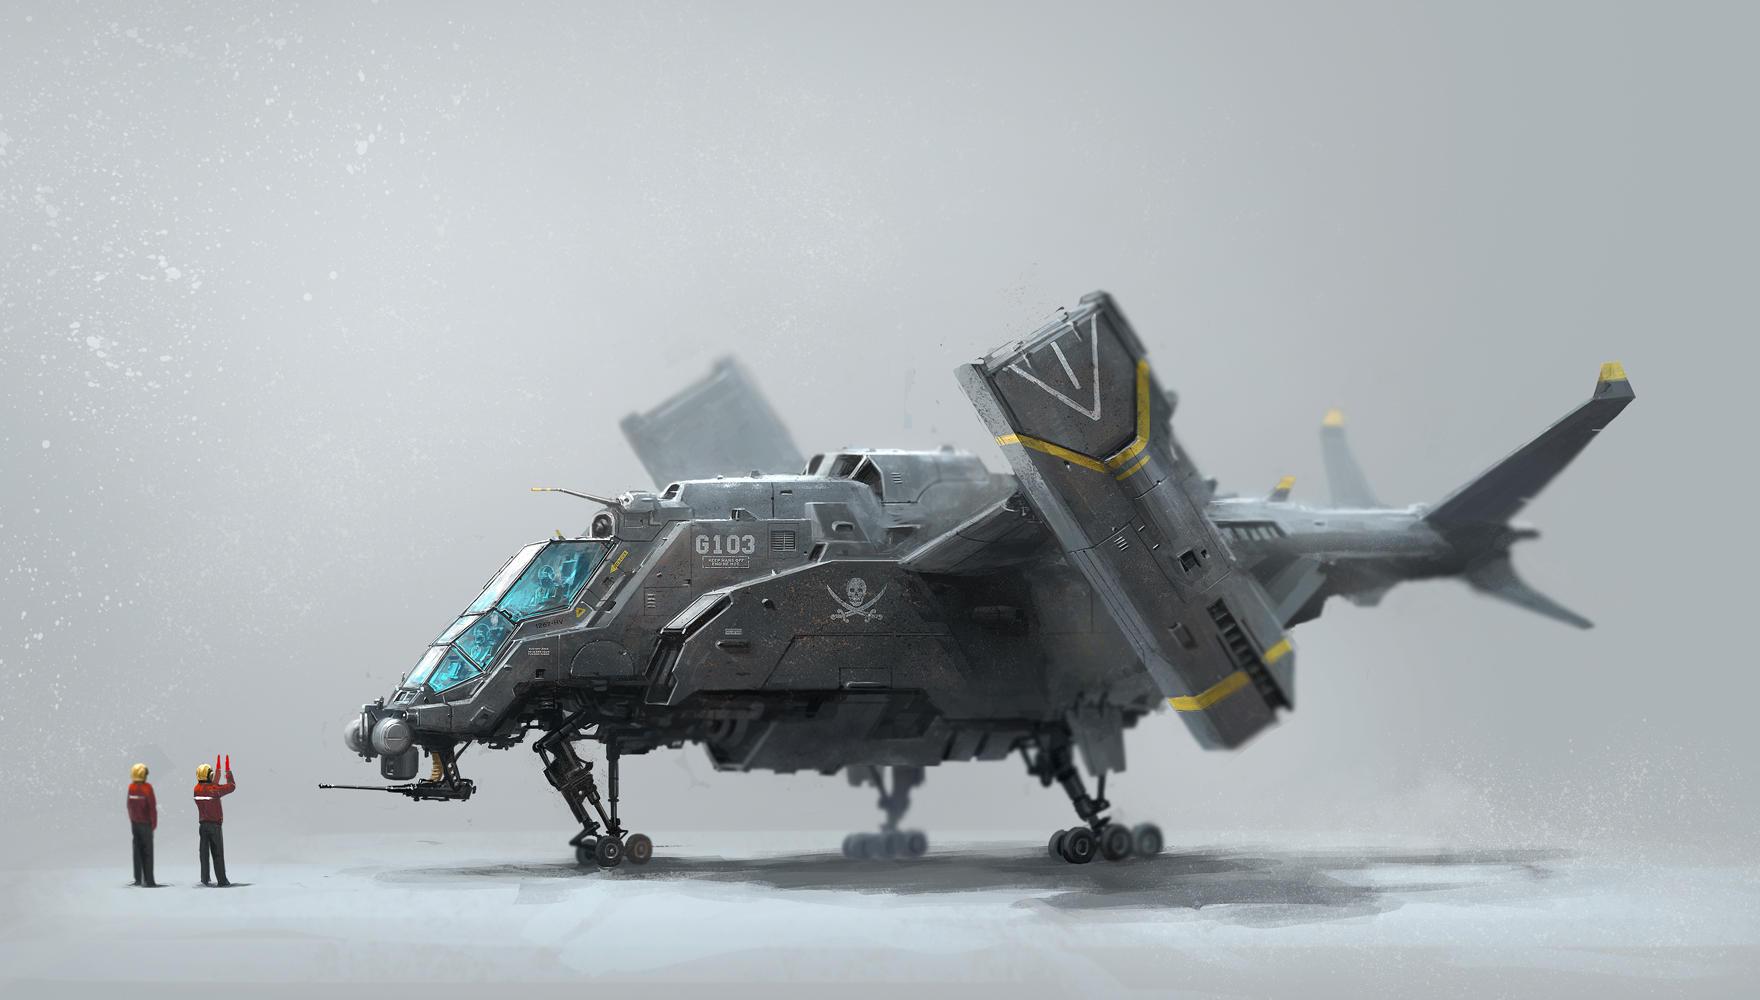 G103 aircraft by alex-ichim